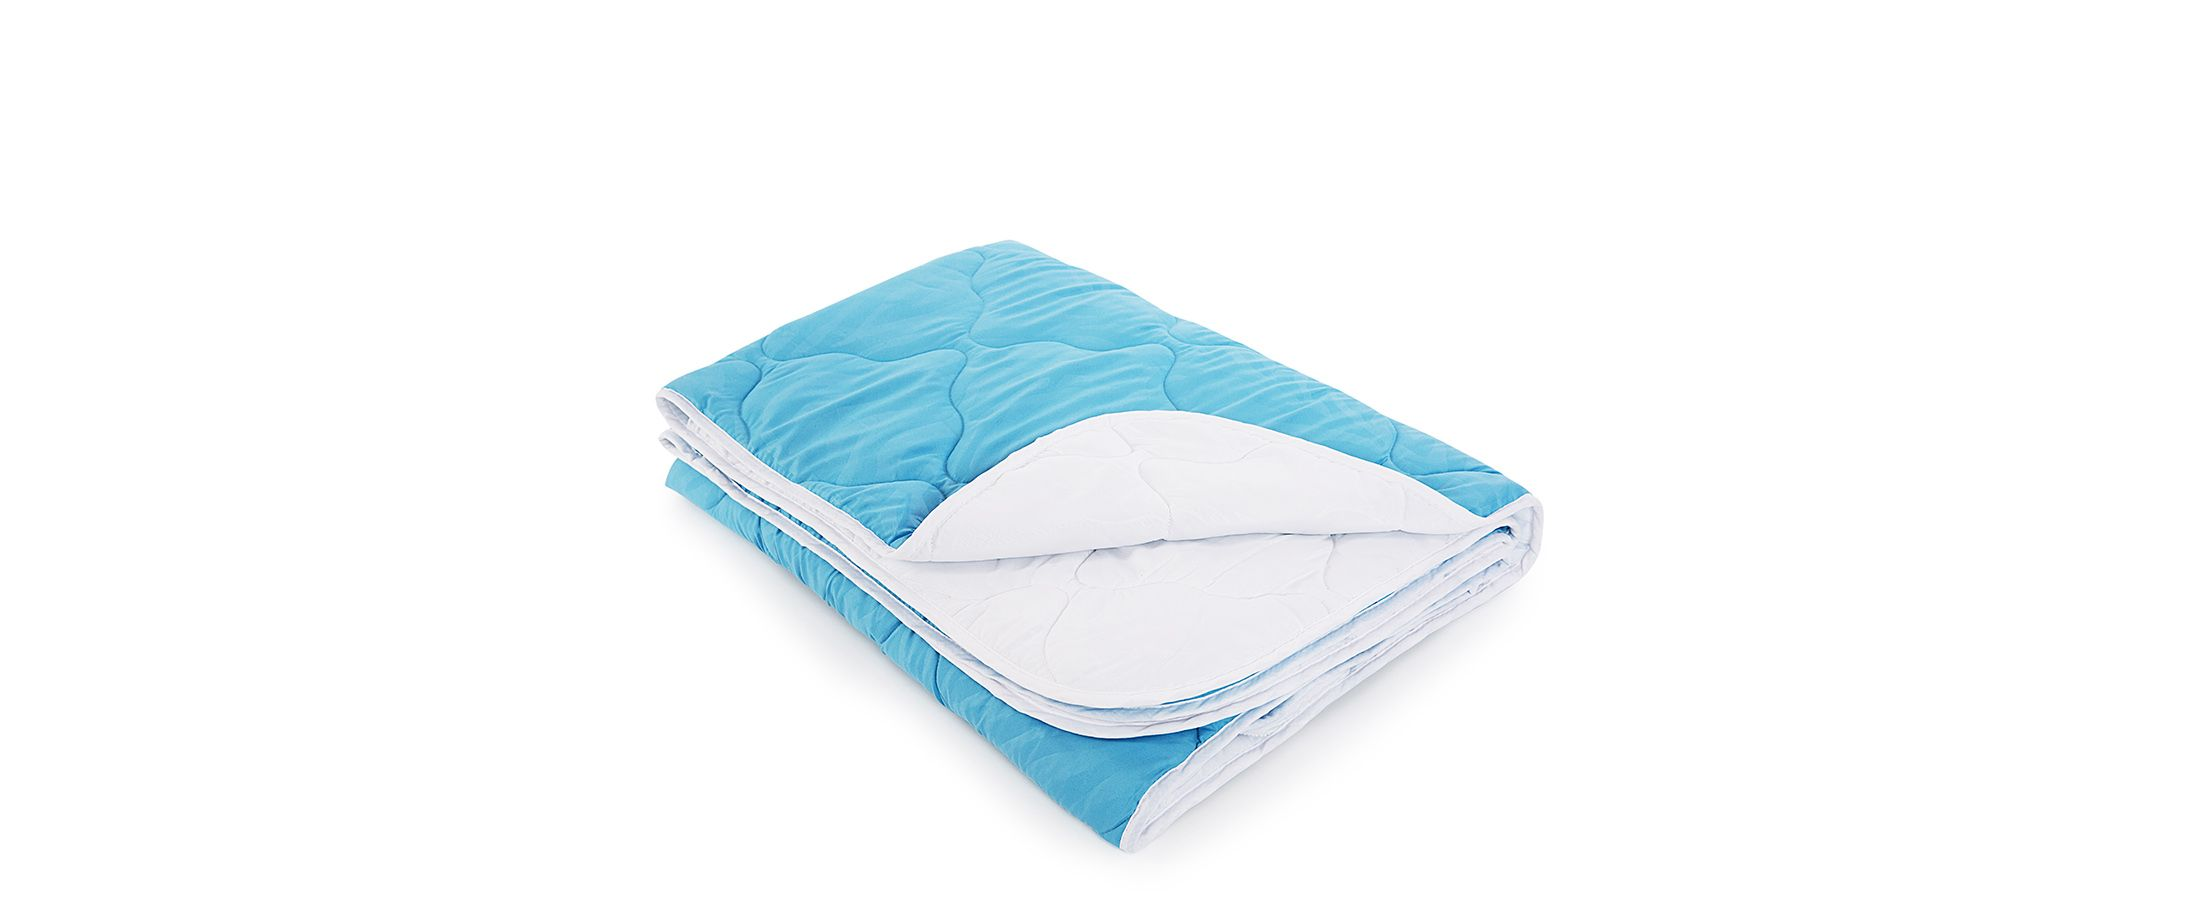 Одеяло «Для тебя» 172х205 голубого цвета Модель 4004Одеяло «Для тебя» 172х205 голубого цвета Модель 4004. Артикул К000734<br><br>Ширина см: 172<br>Глубина см: 205<br>Высота см: 3<br>Цвет: Голубой<br>Материал: Микрофибра